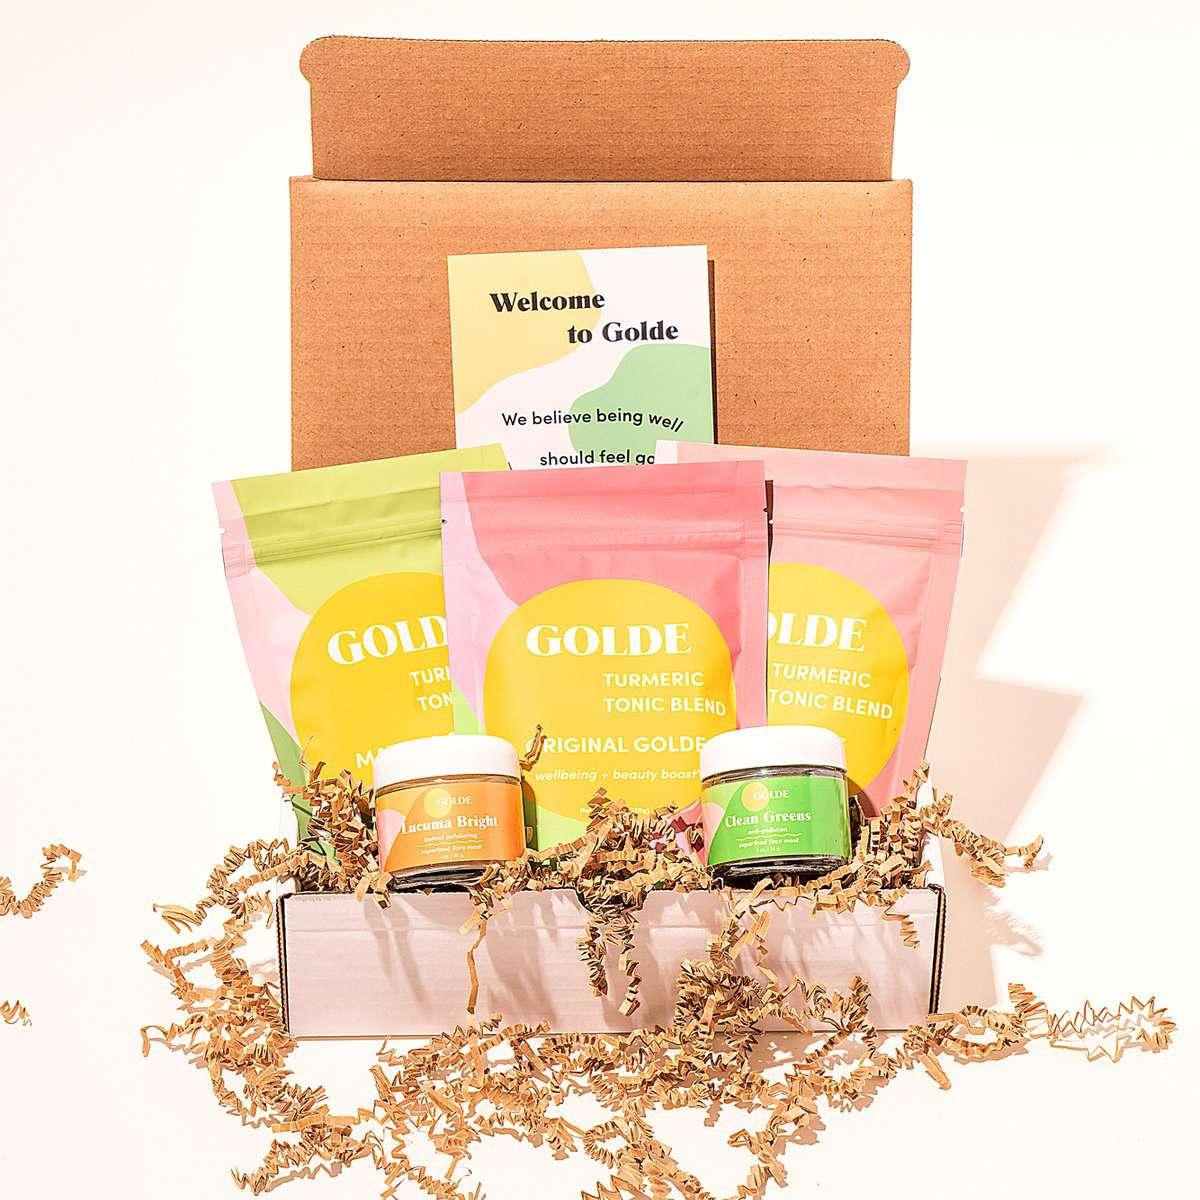 Golde Complete Beauty + Wellness Kit